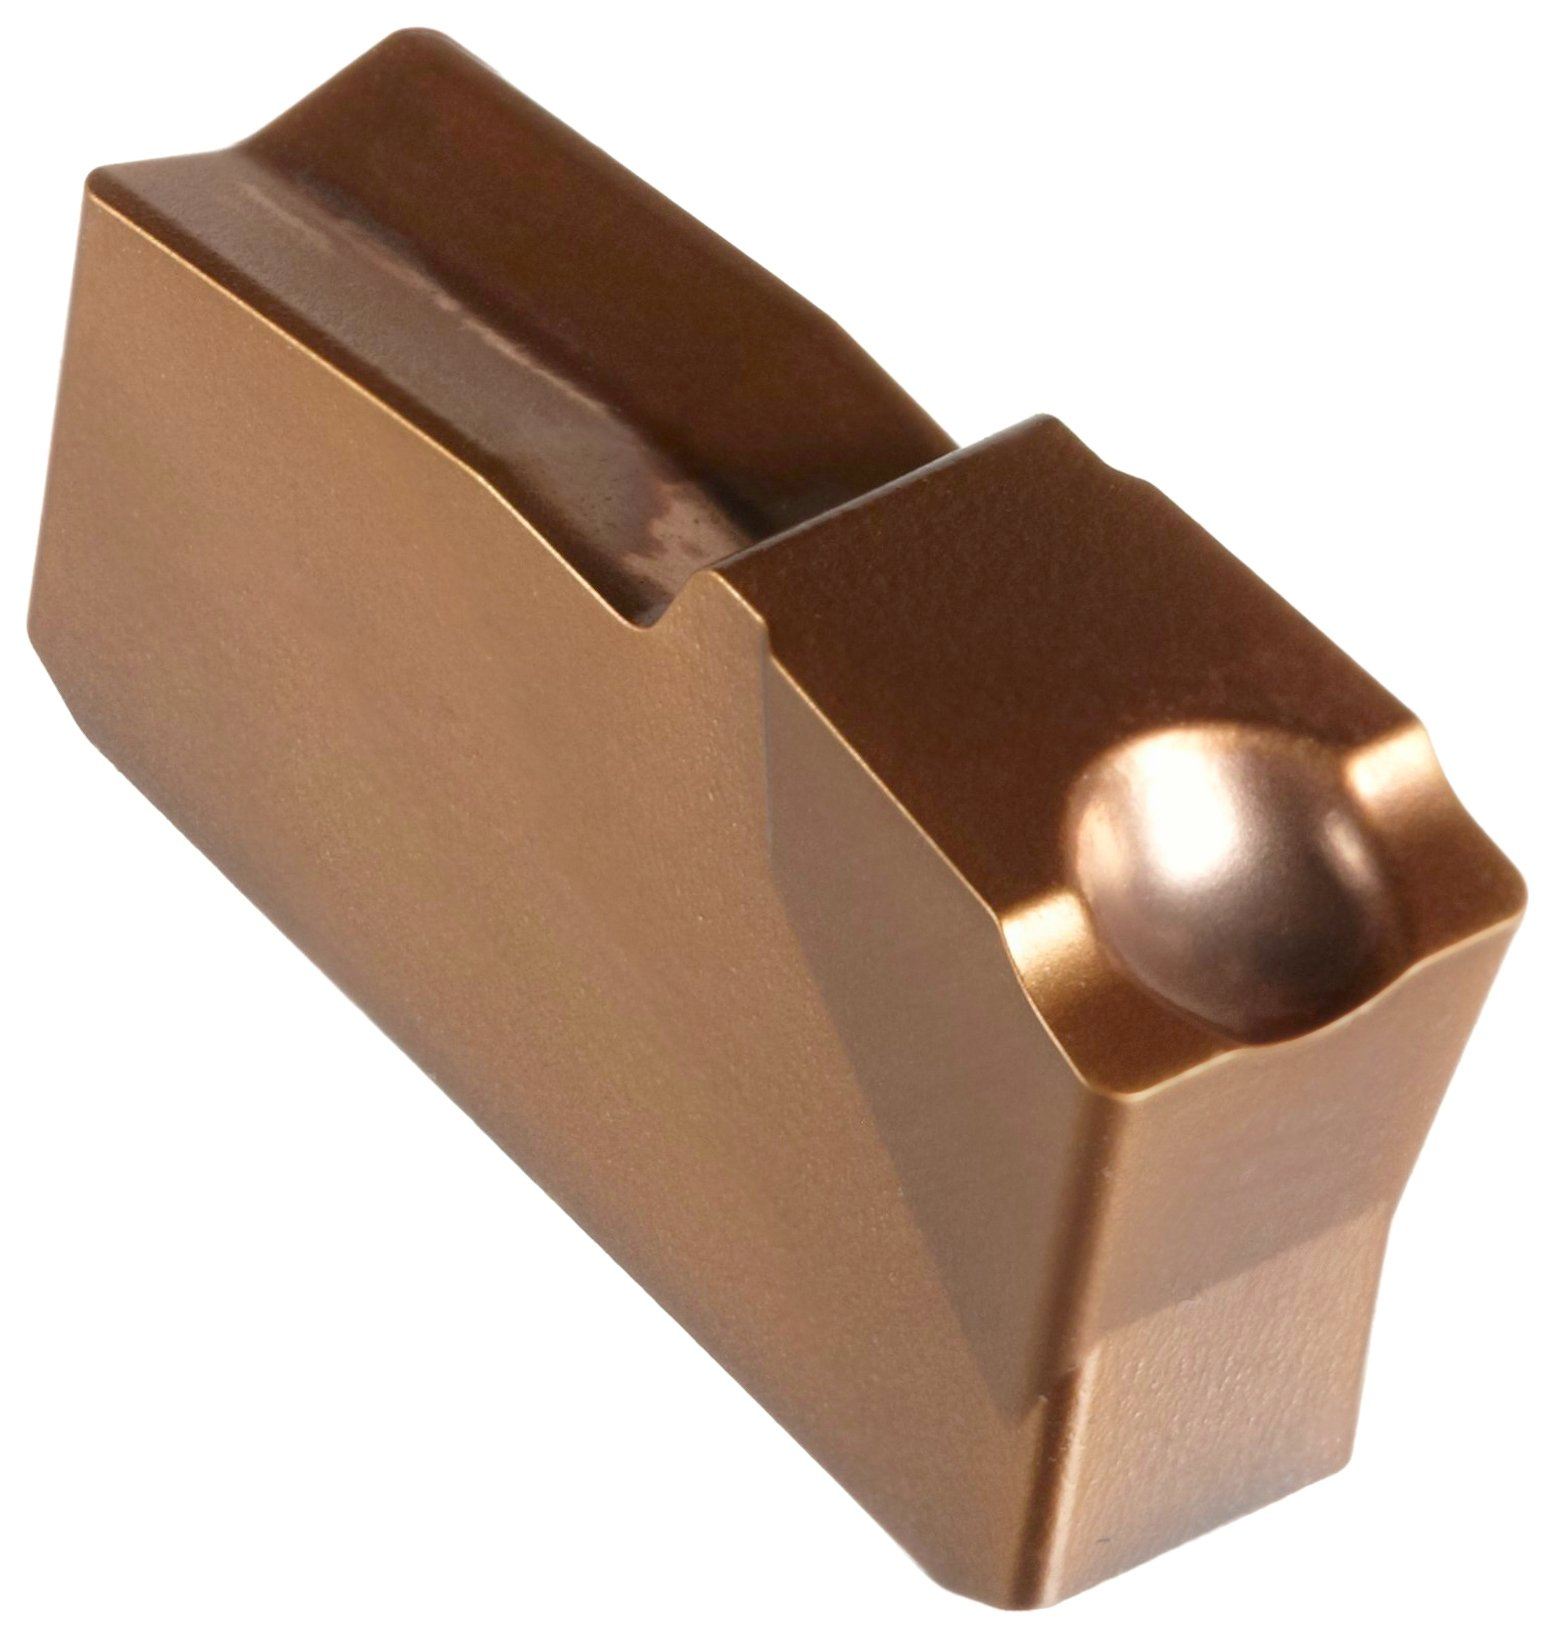 Sandvik Coromant Q-Cut 151.2 Carbide Parting Insert, GC1125 Grade, Multi-Layer Coating, 4E Chipbreaker, 1 Cutting Edge, N151.2-400-4E, 0.0118'' Corner Radius, 40 Insert Seat Size (Pack of 10)